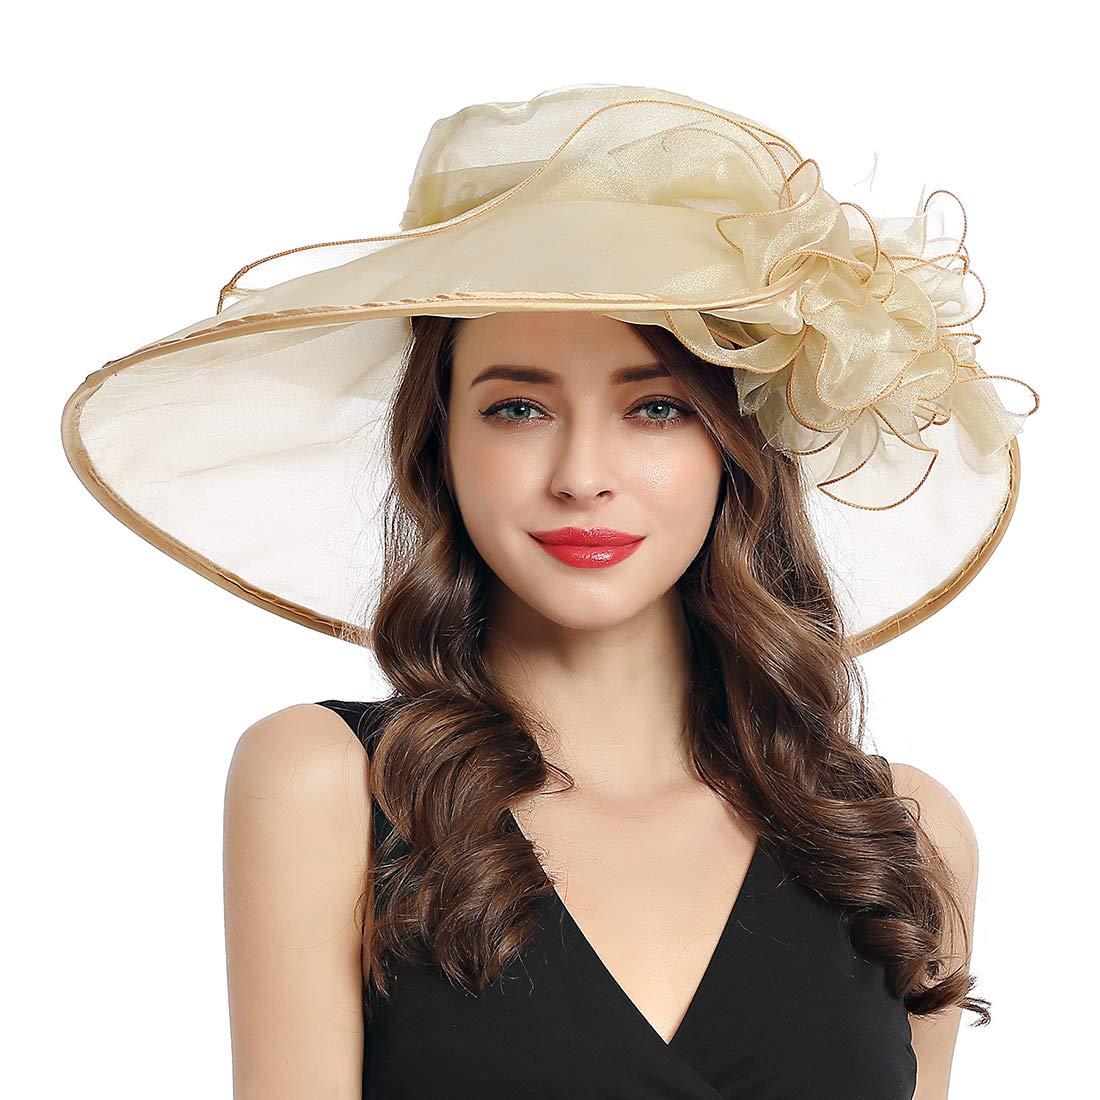 Women's Organza Church Derby Fascinator Cap Kentucky Tea Party Wedding Hat (9A-Champagne) by MissCynthia